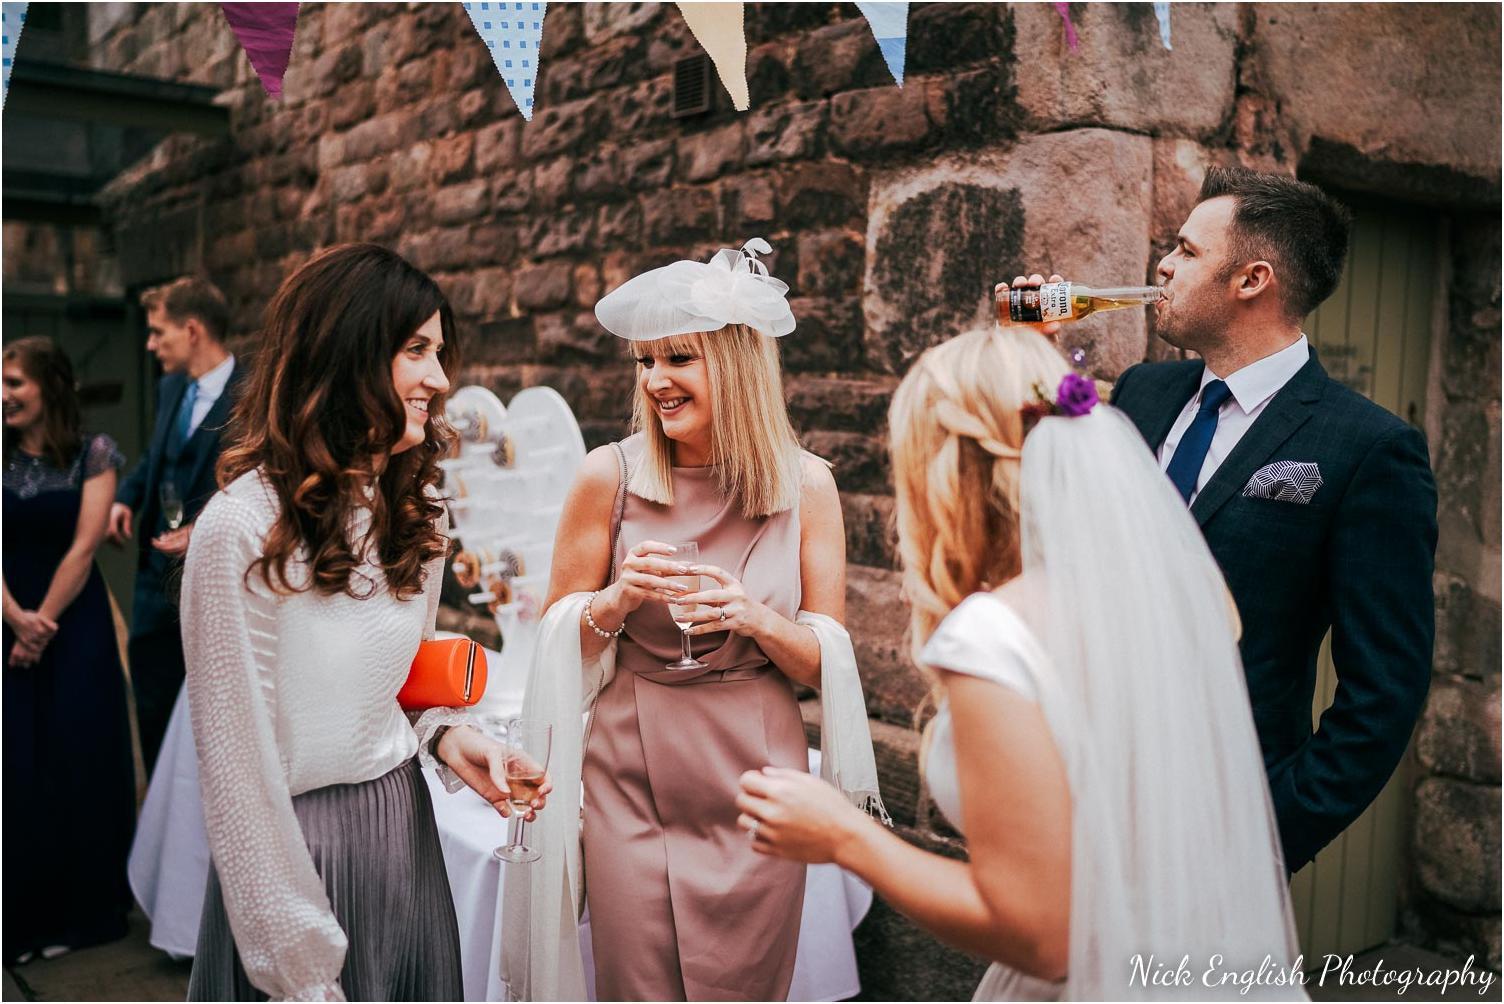 The_Ashes_Barn_Endon_Stoke_Wedding_Photographer-88.jpg